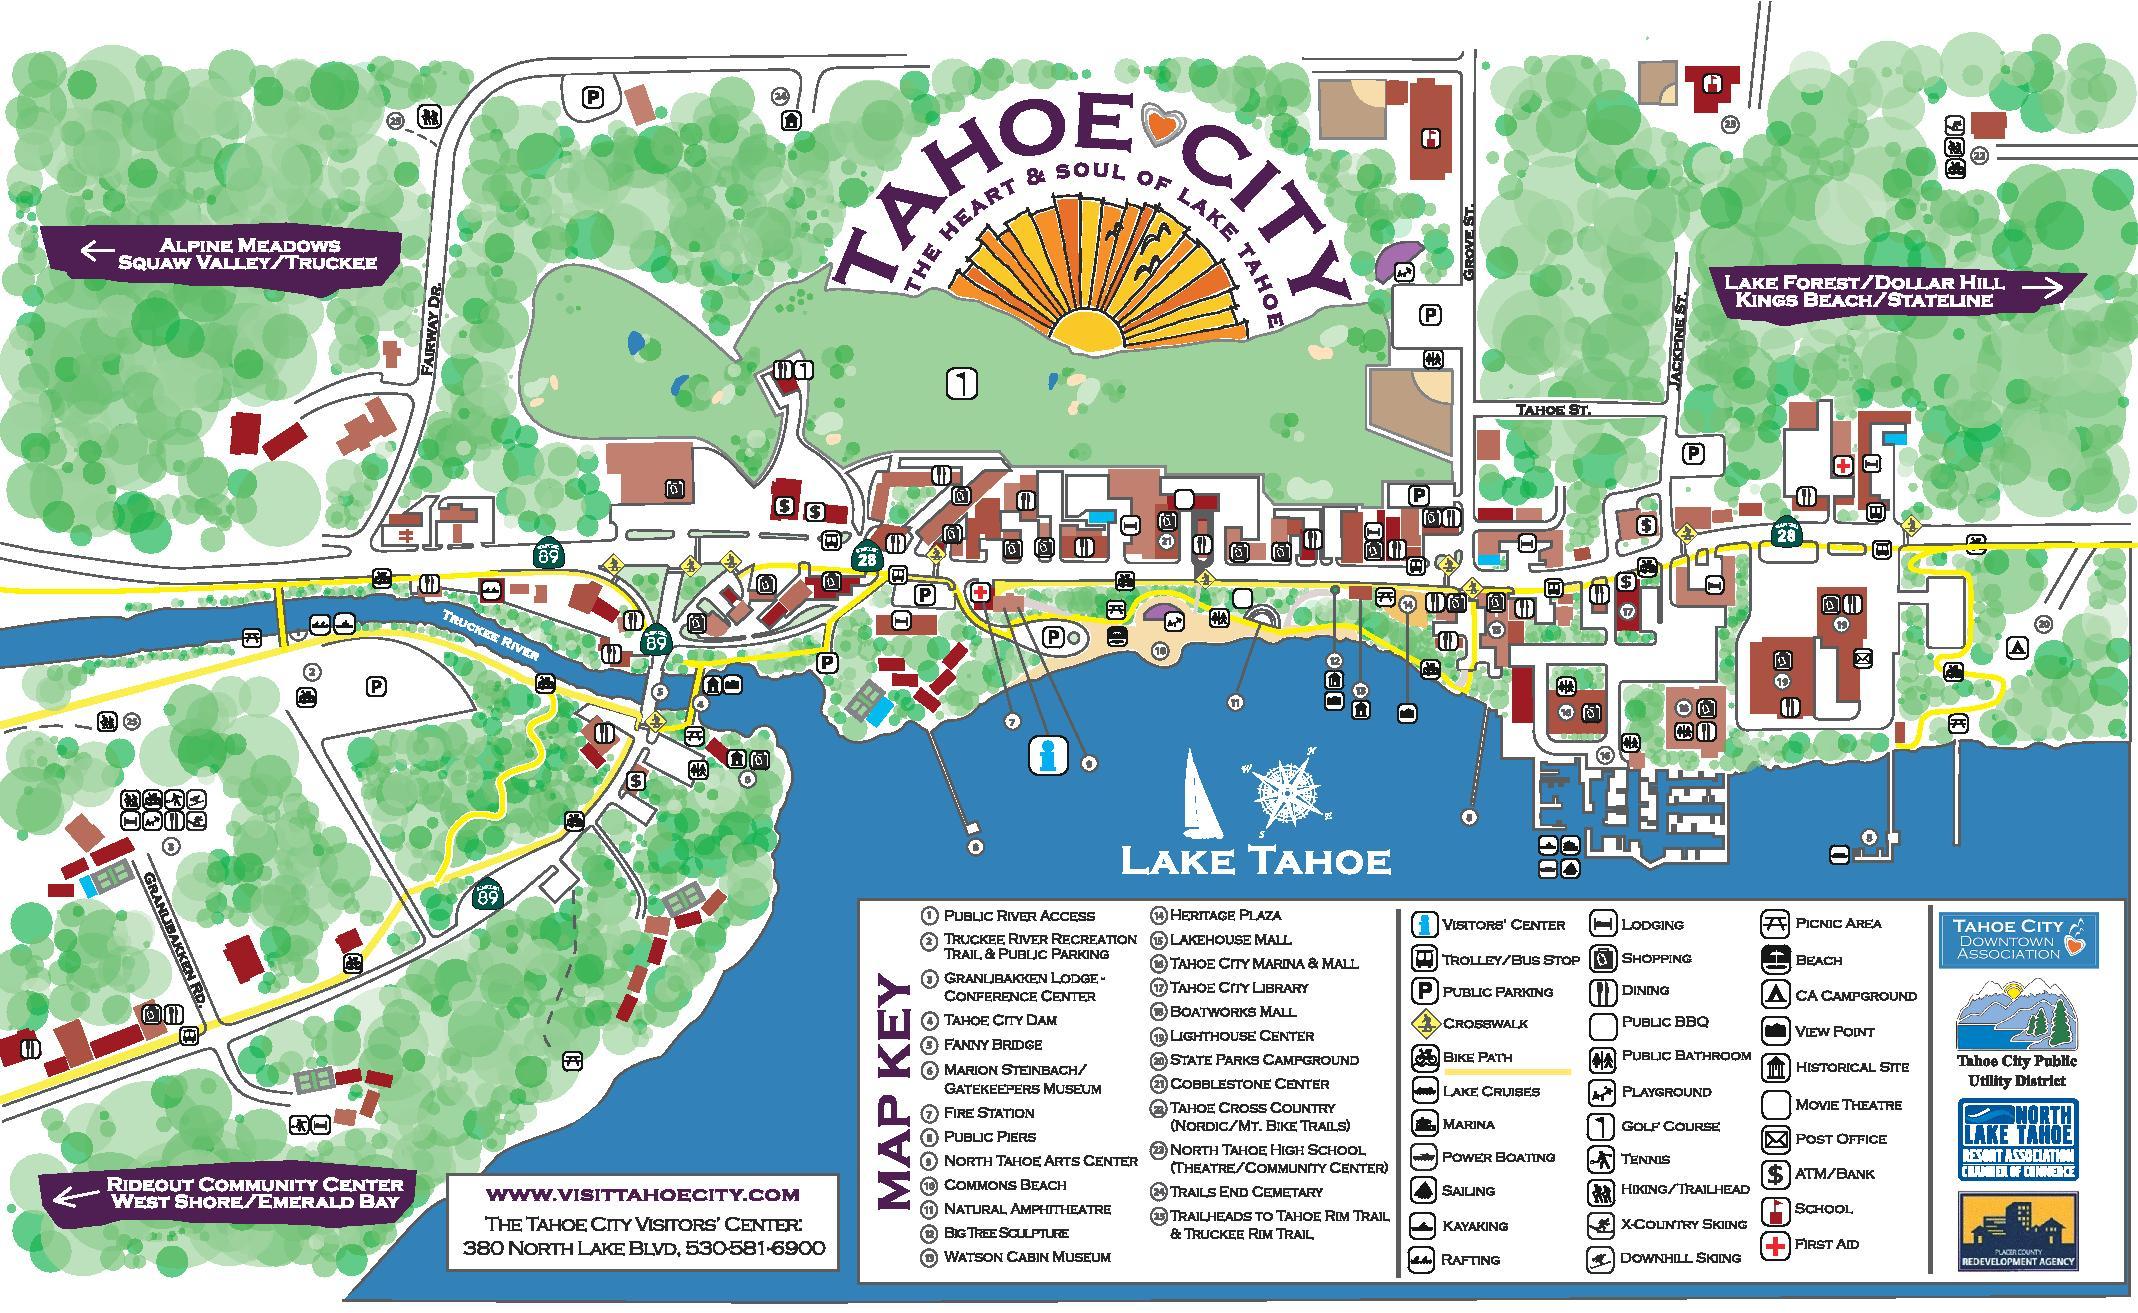 Maps - Tahoe City Downtown Association - Tahoe City California Map